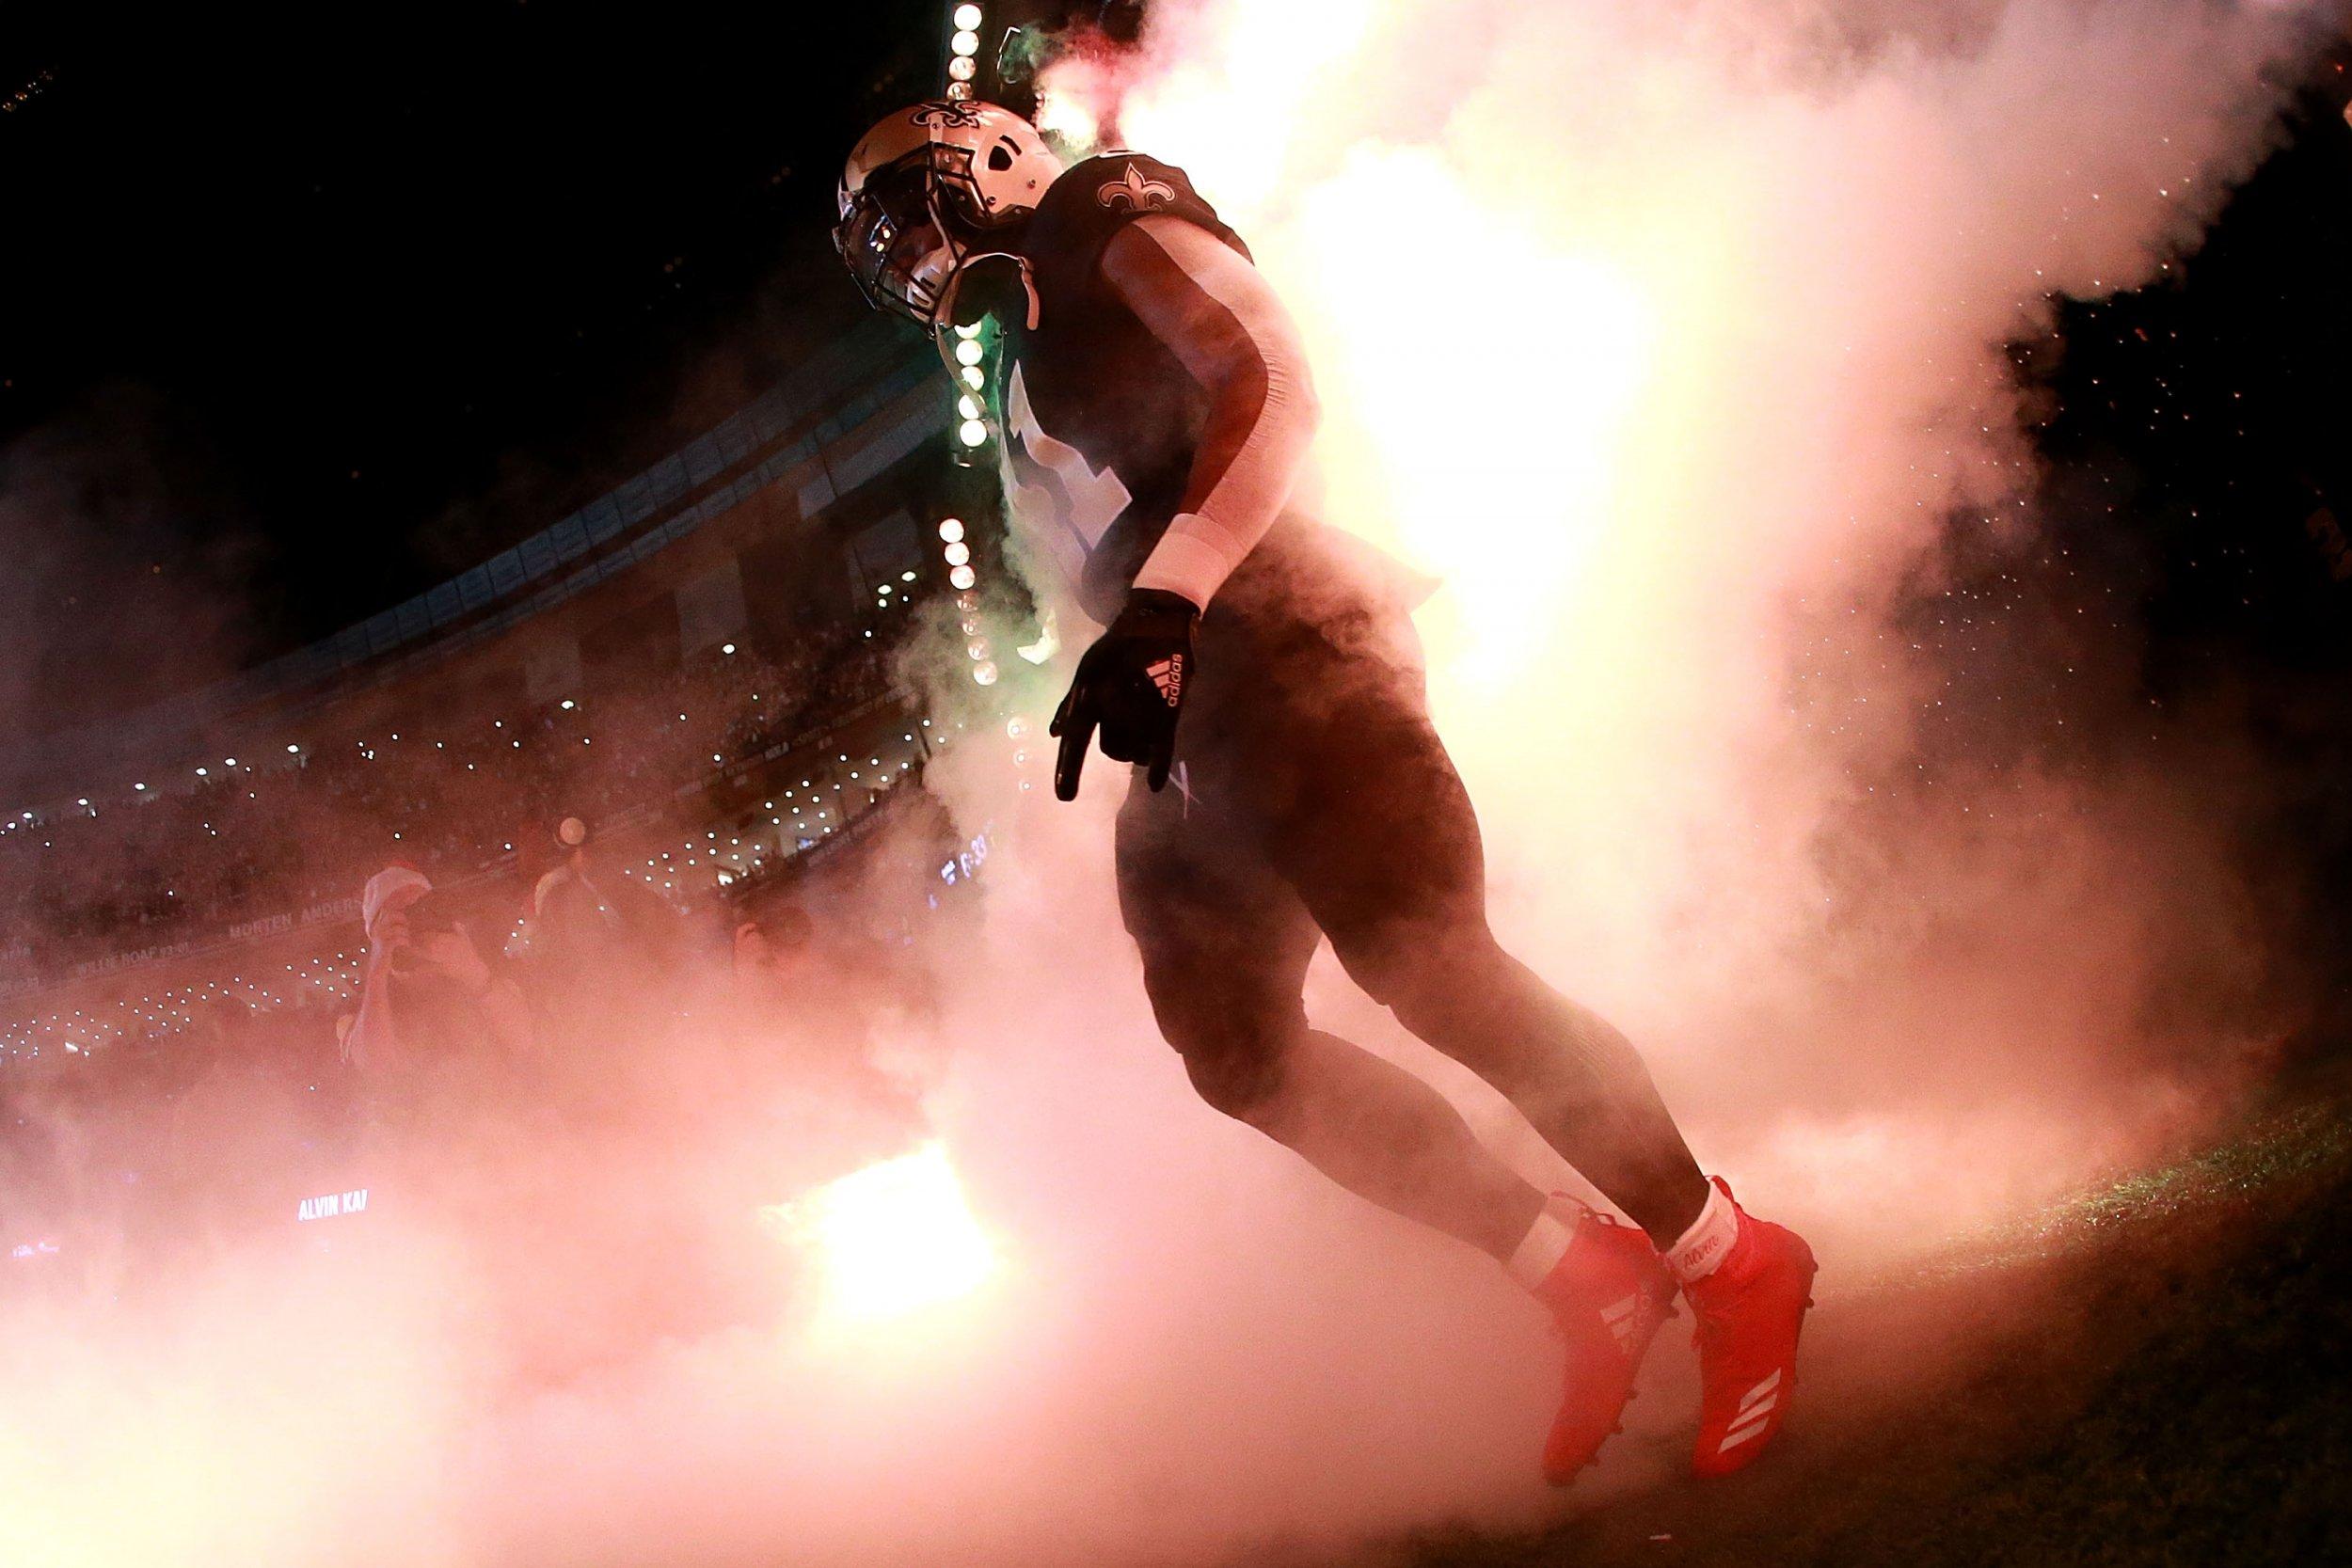 Alvin Kamara of the New Orleans Saints in New Orleans, Louisiana, December 24 2017.